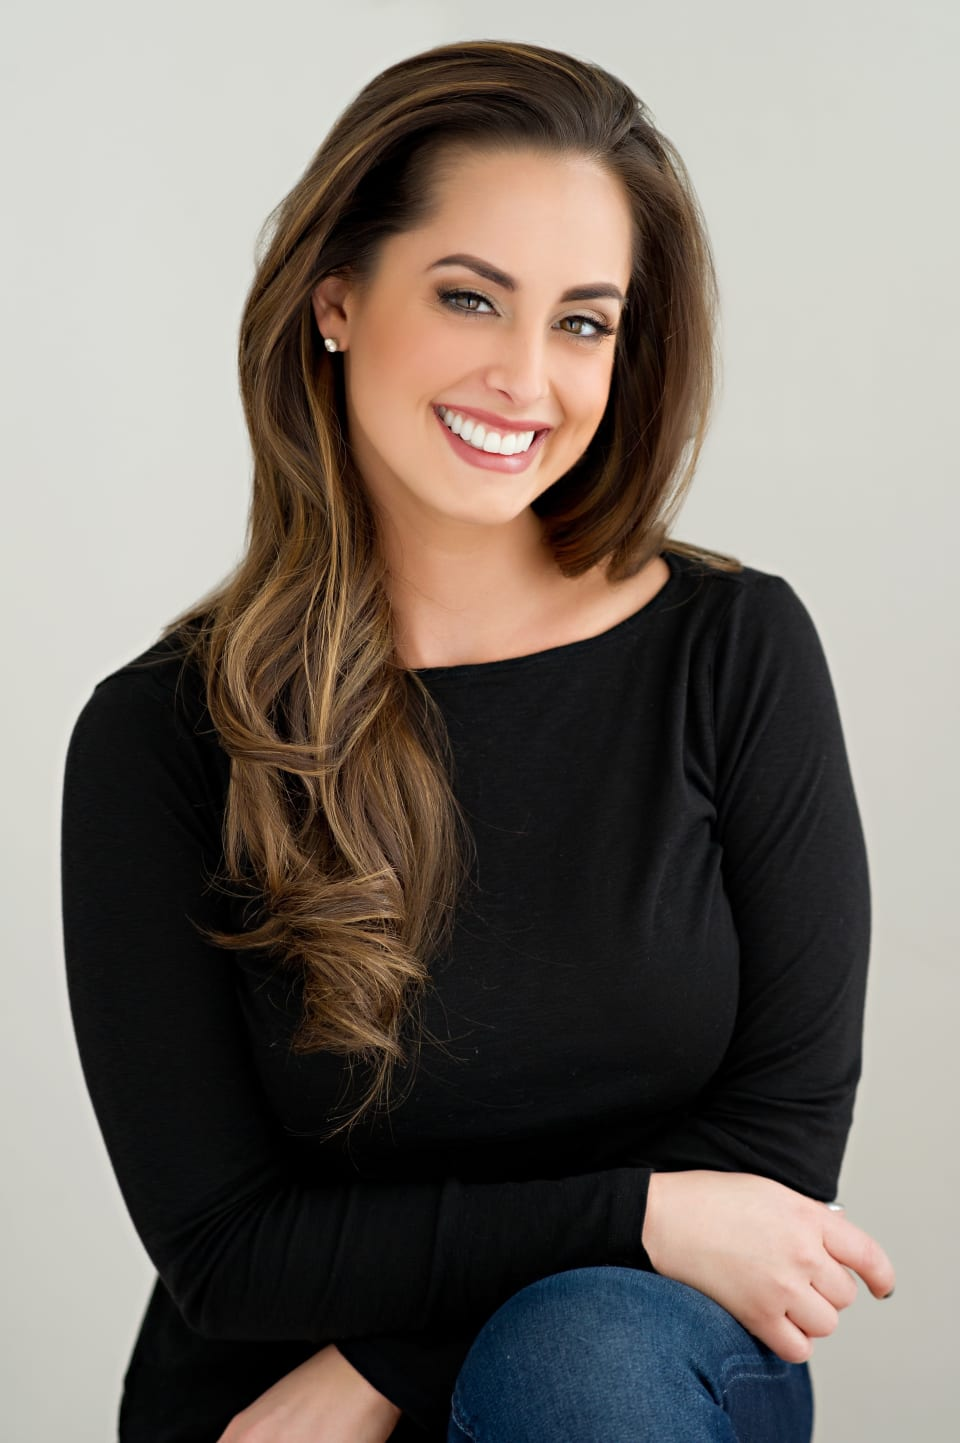 Carlee Wright